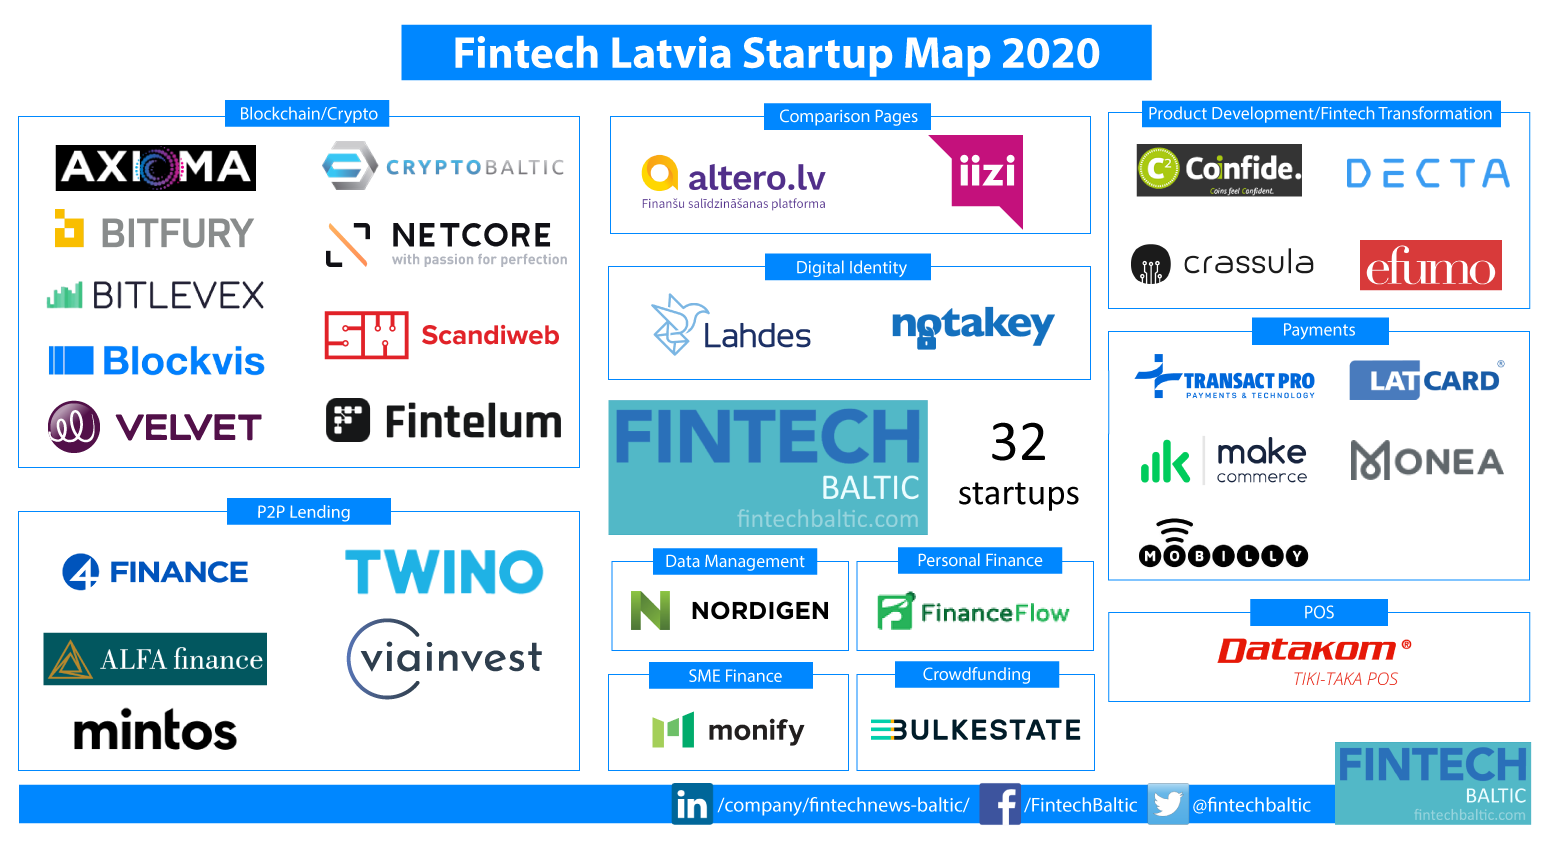 Fintech Latvia Startup Map 2020